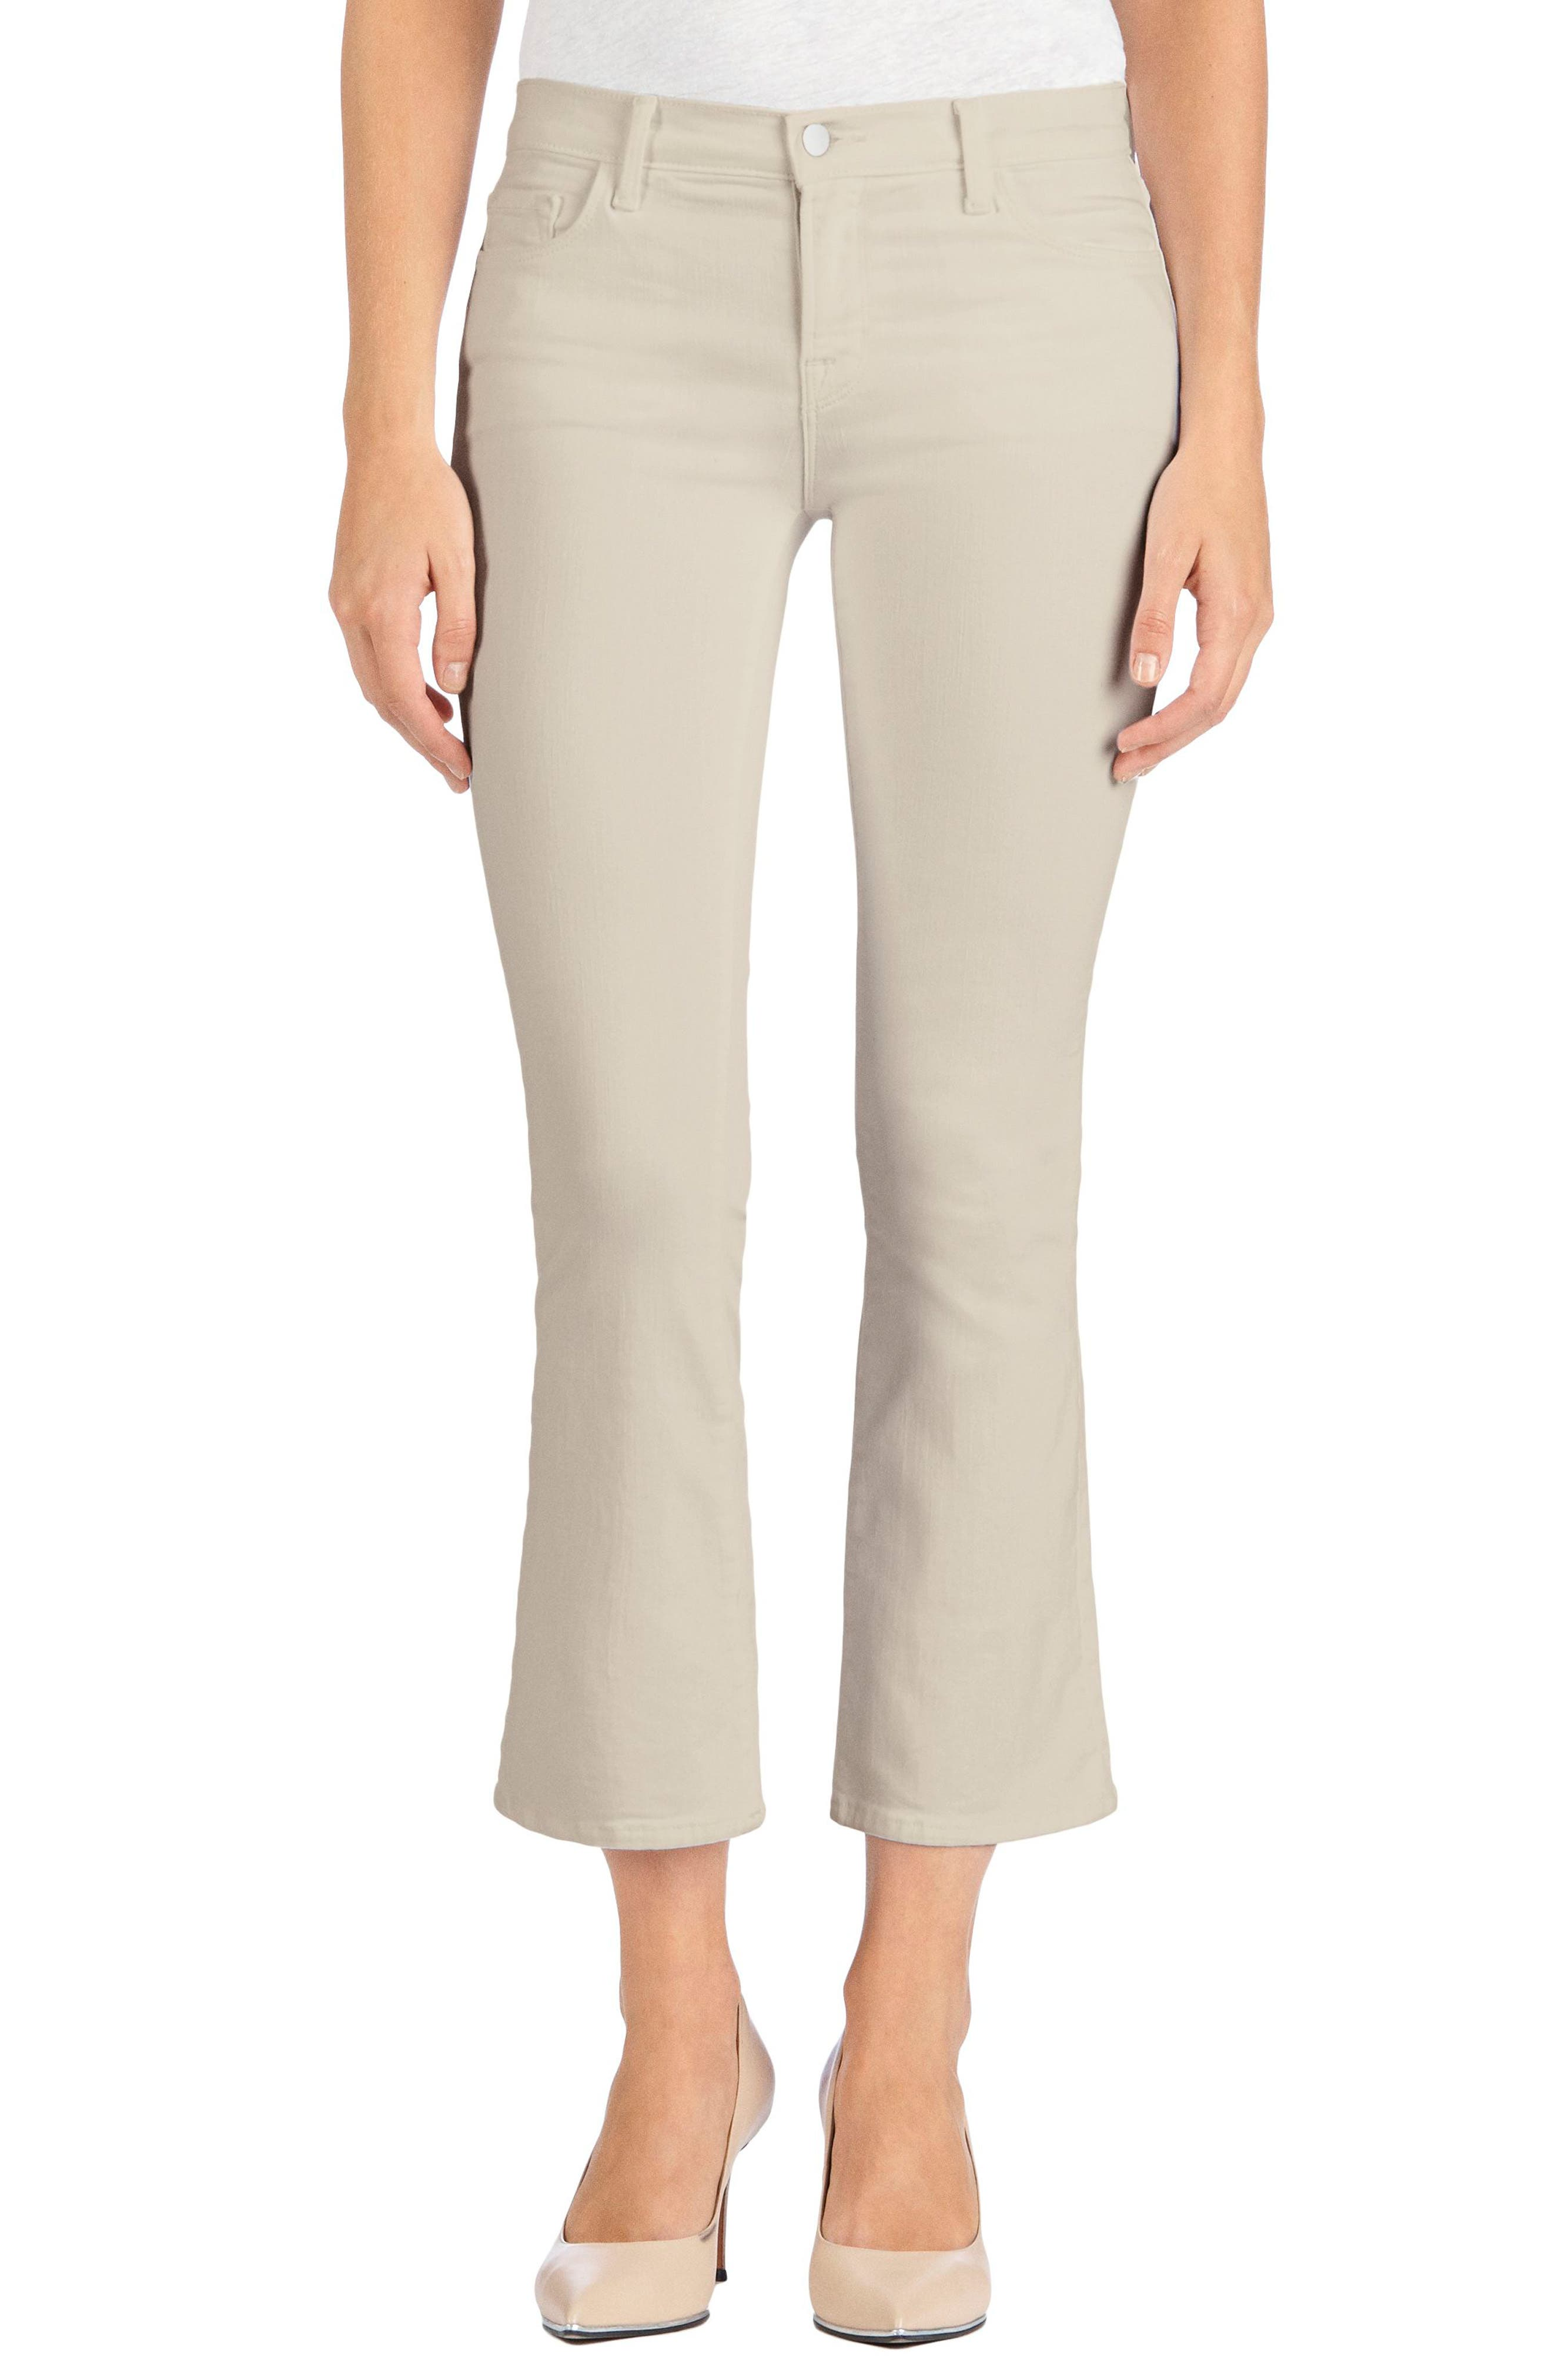 Main Image - J Brand Selena Crop Bootcut Jeans (Distressed Silver Birch)